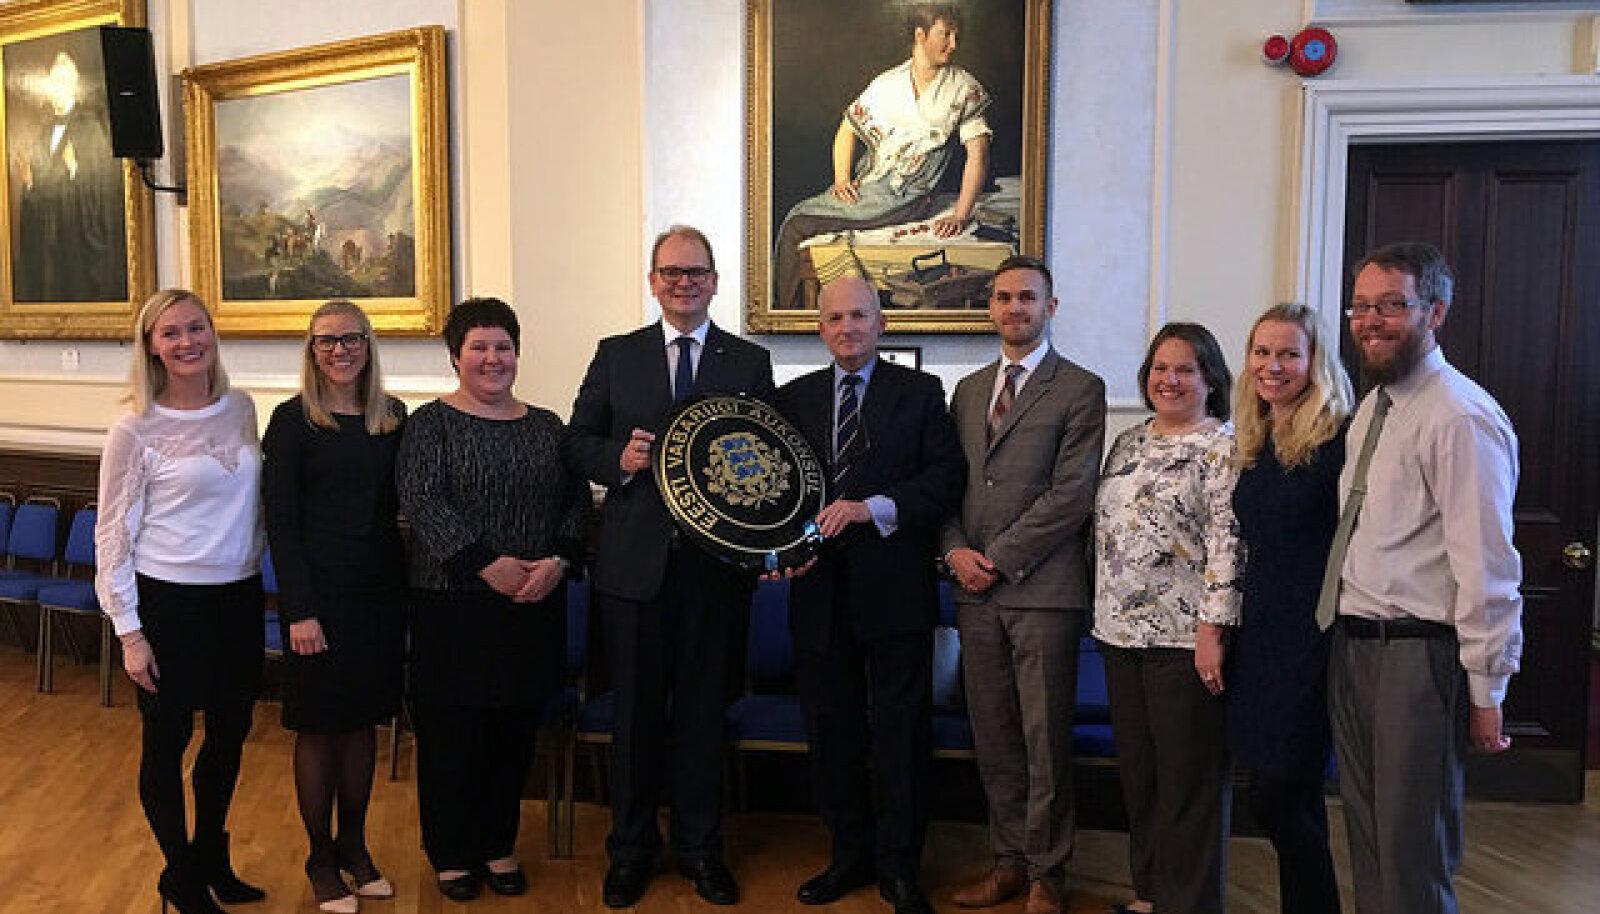 Eesti avas aukonsuli esinduse Jersey saarel